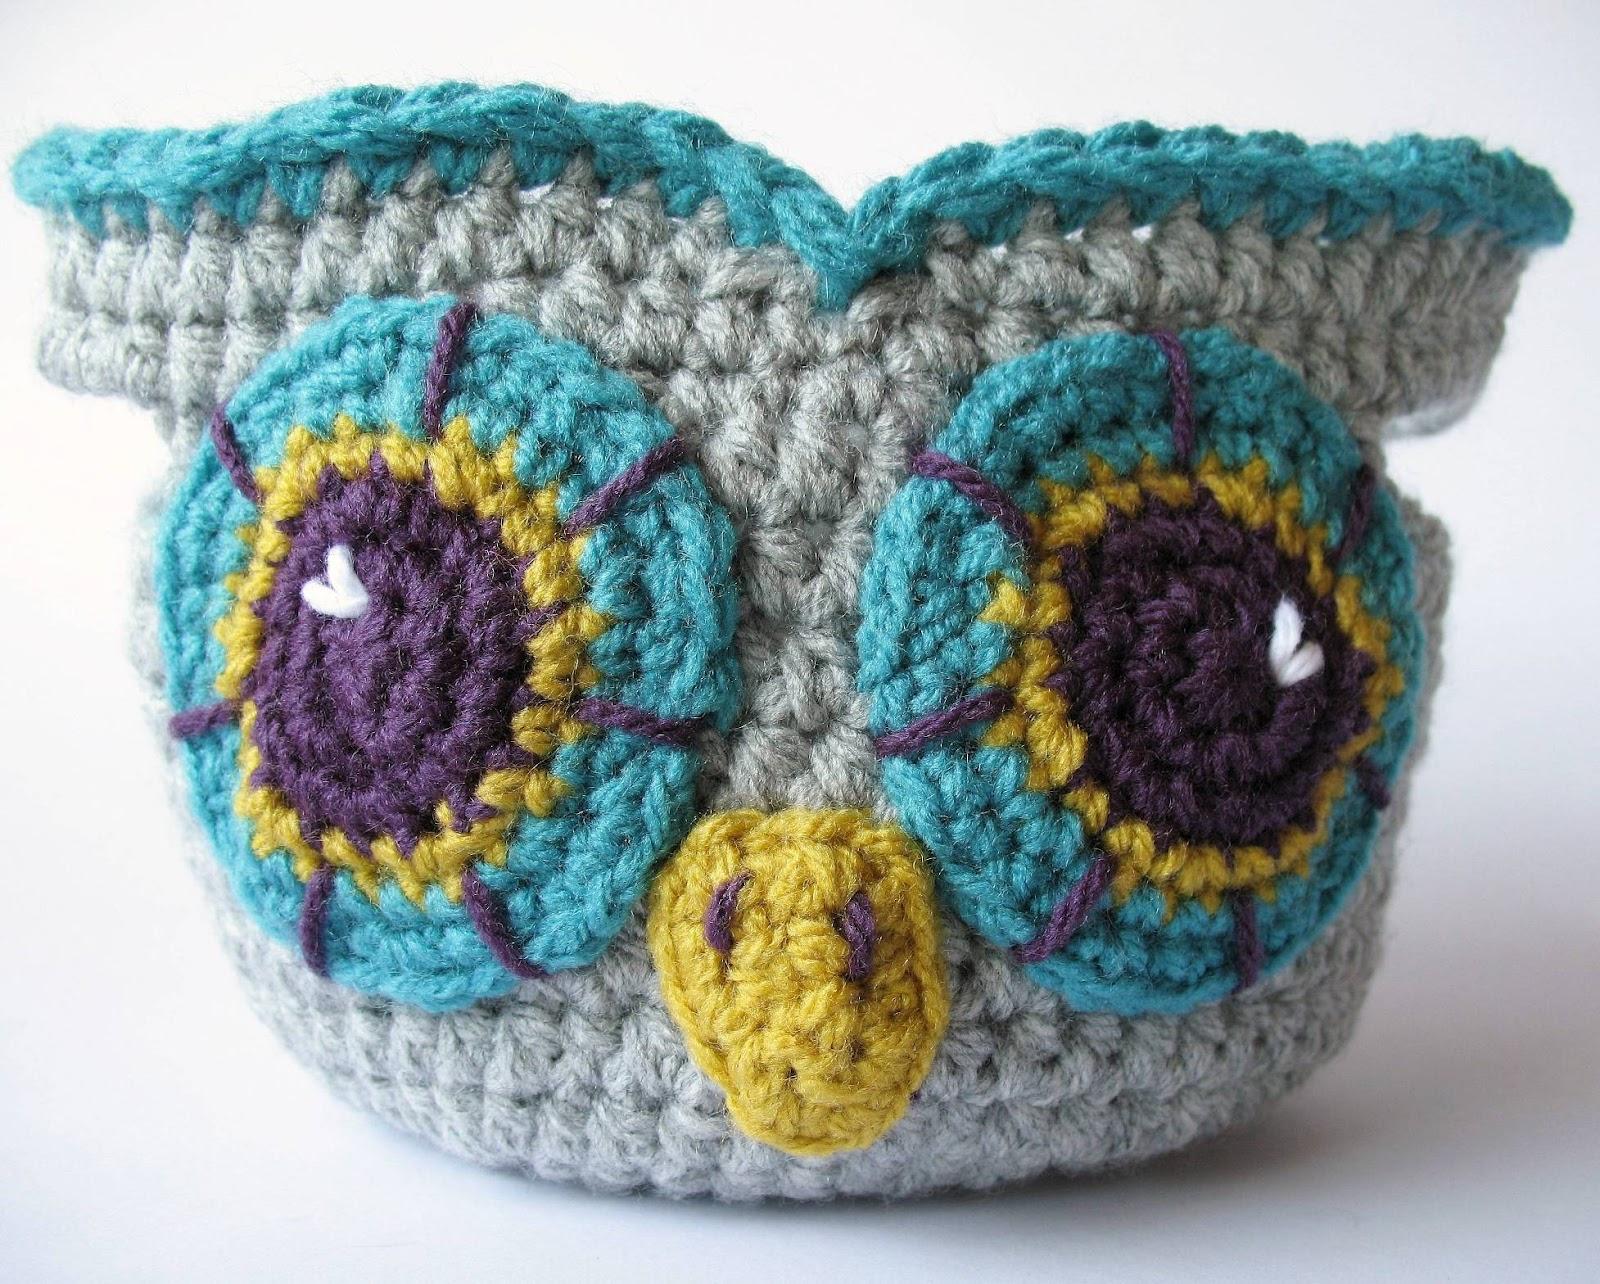 Crochet Owl Basket : eclectic me: crochet owl basket...